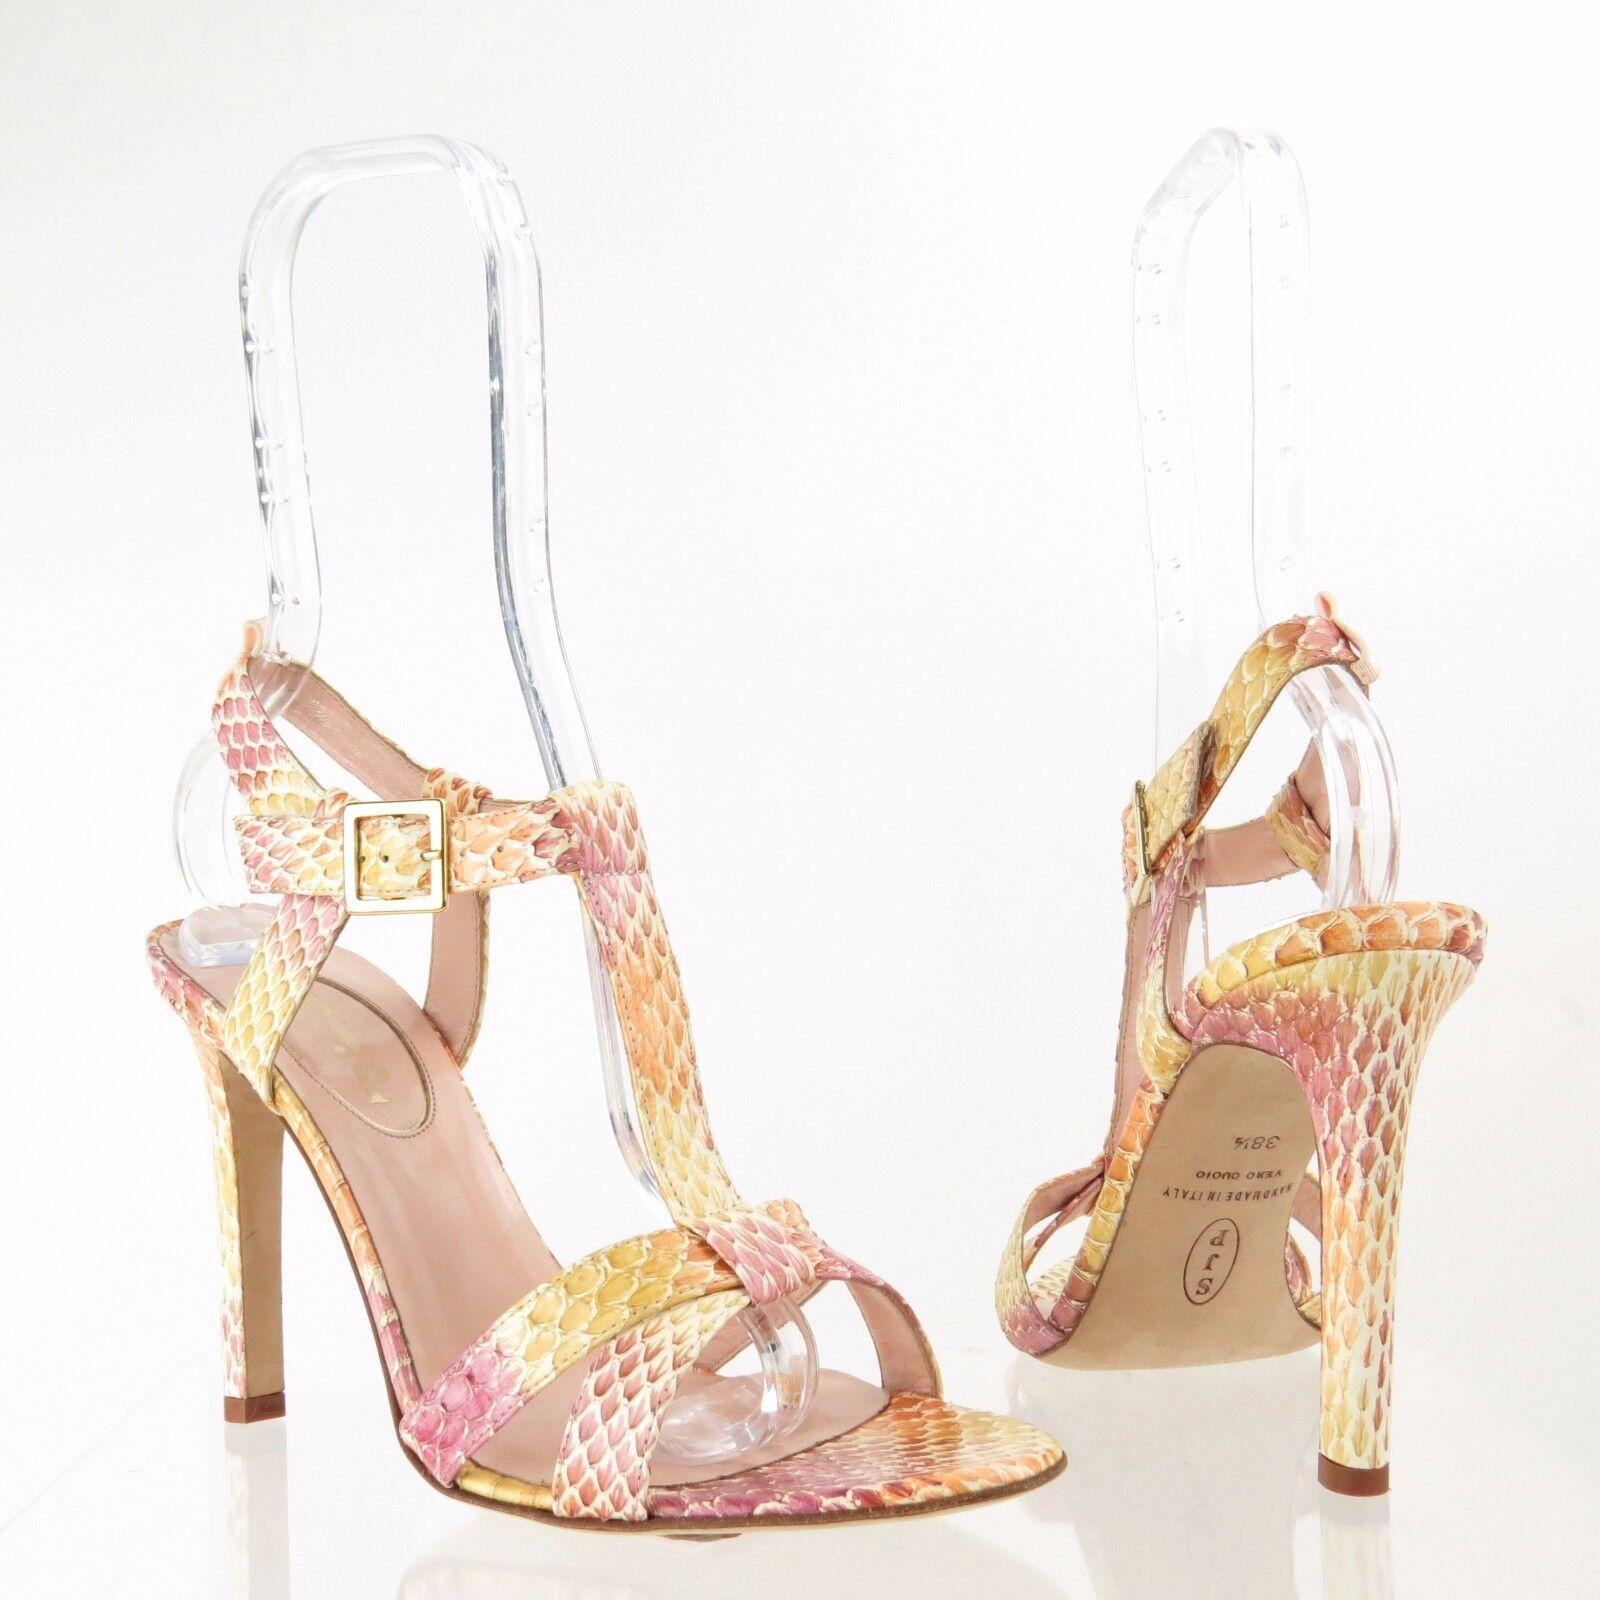 SJP SJP SJP Jo Womens shoes Leather Multi-color Snakeskin Print Heels Sz EU 38.5 NEW  395 1c725a